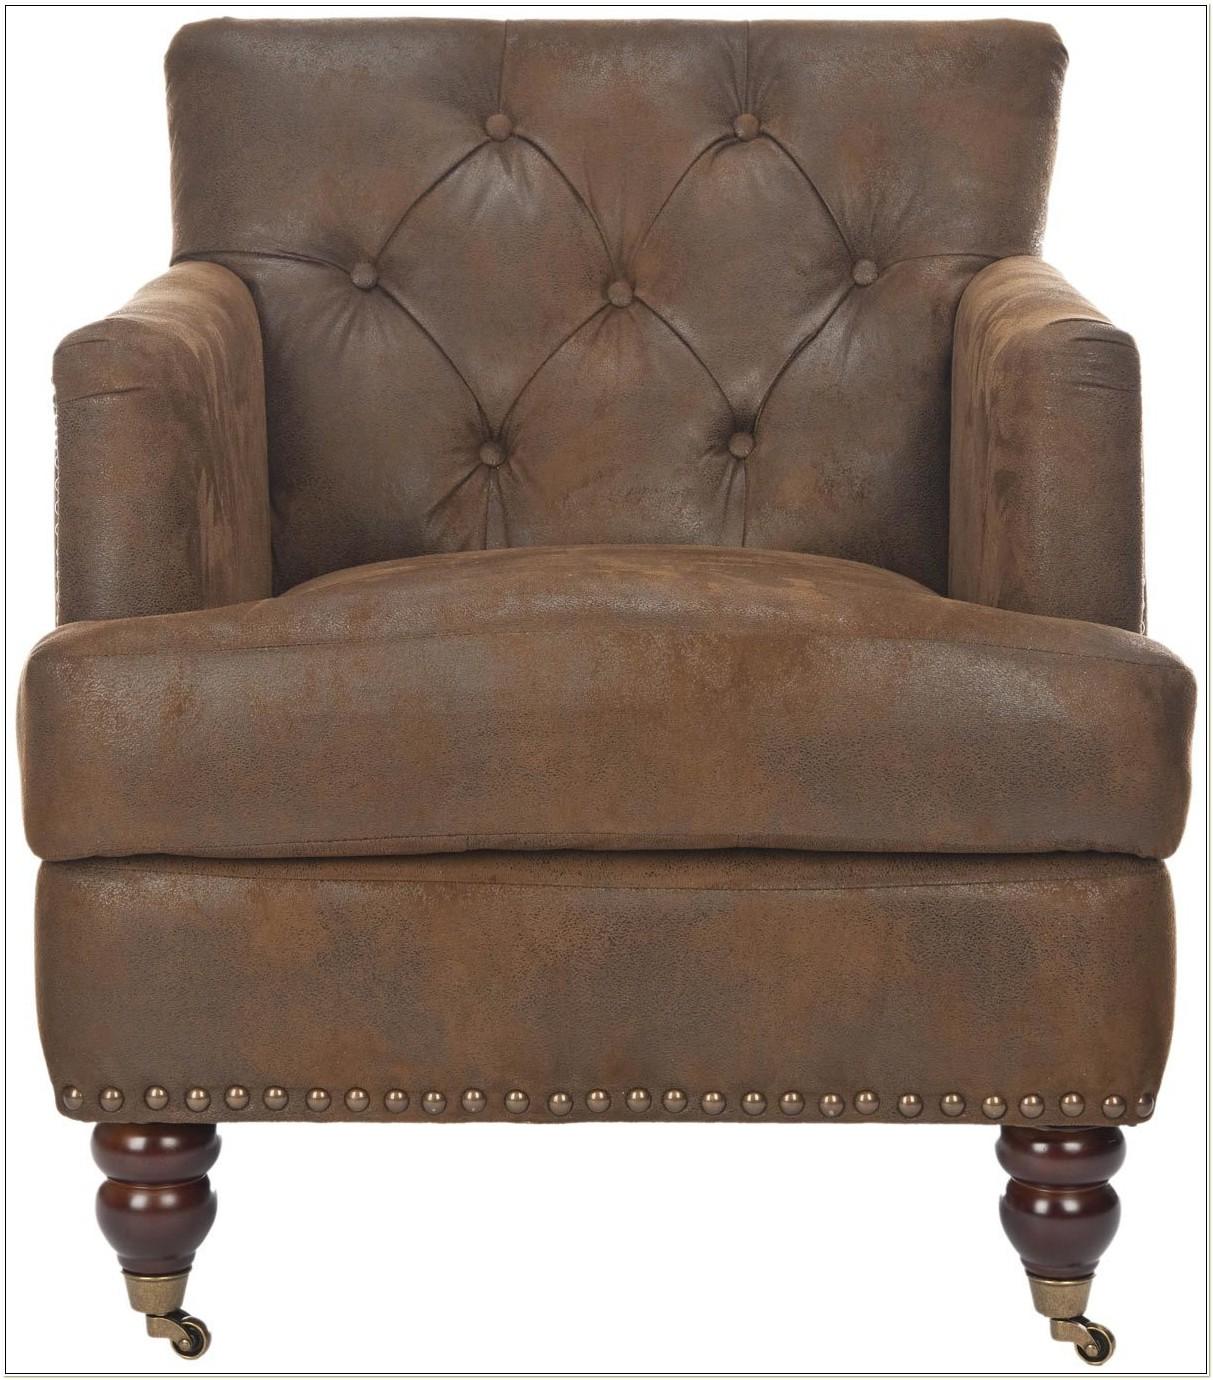 Safavieh Colin Leather Tufted Club Chair